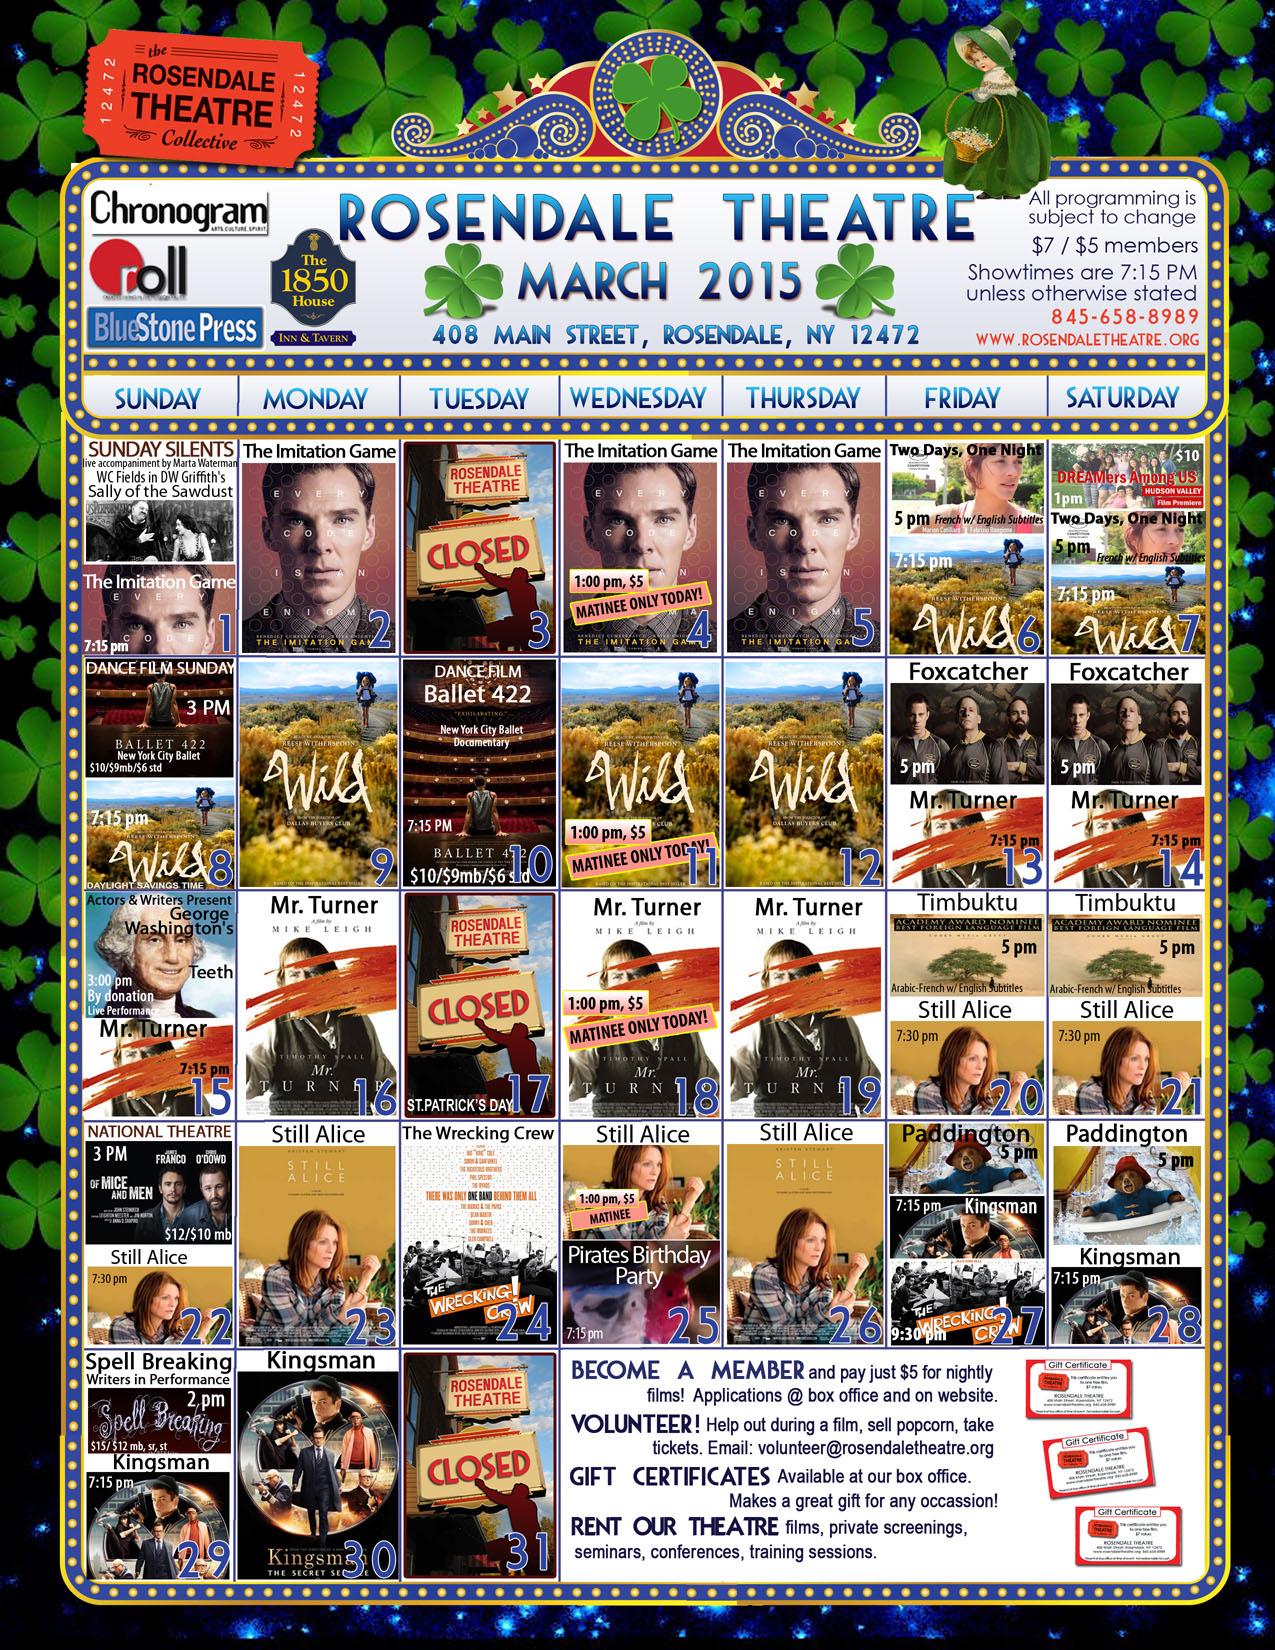 March 2015 Calendar Rosendale Theatre website